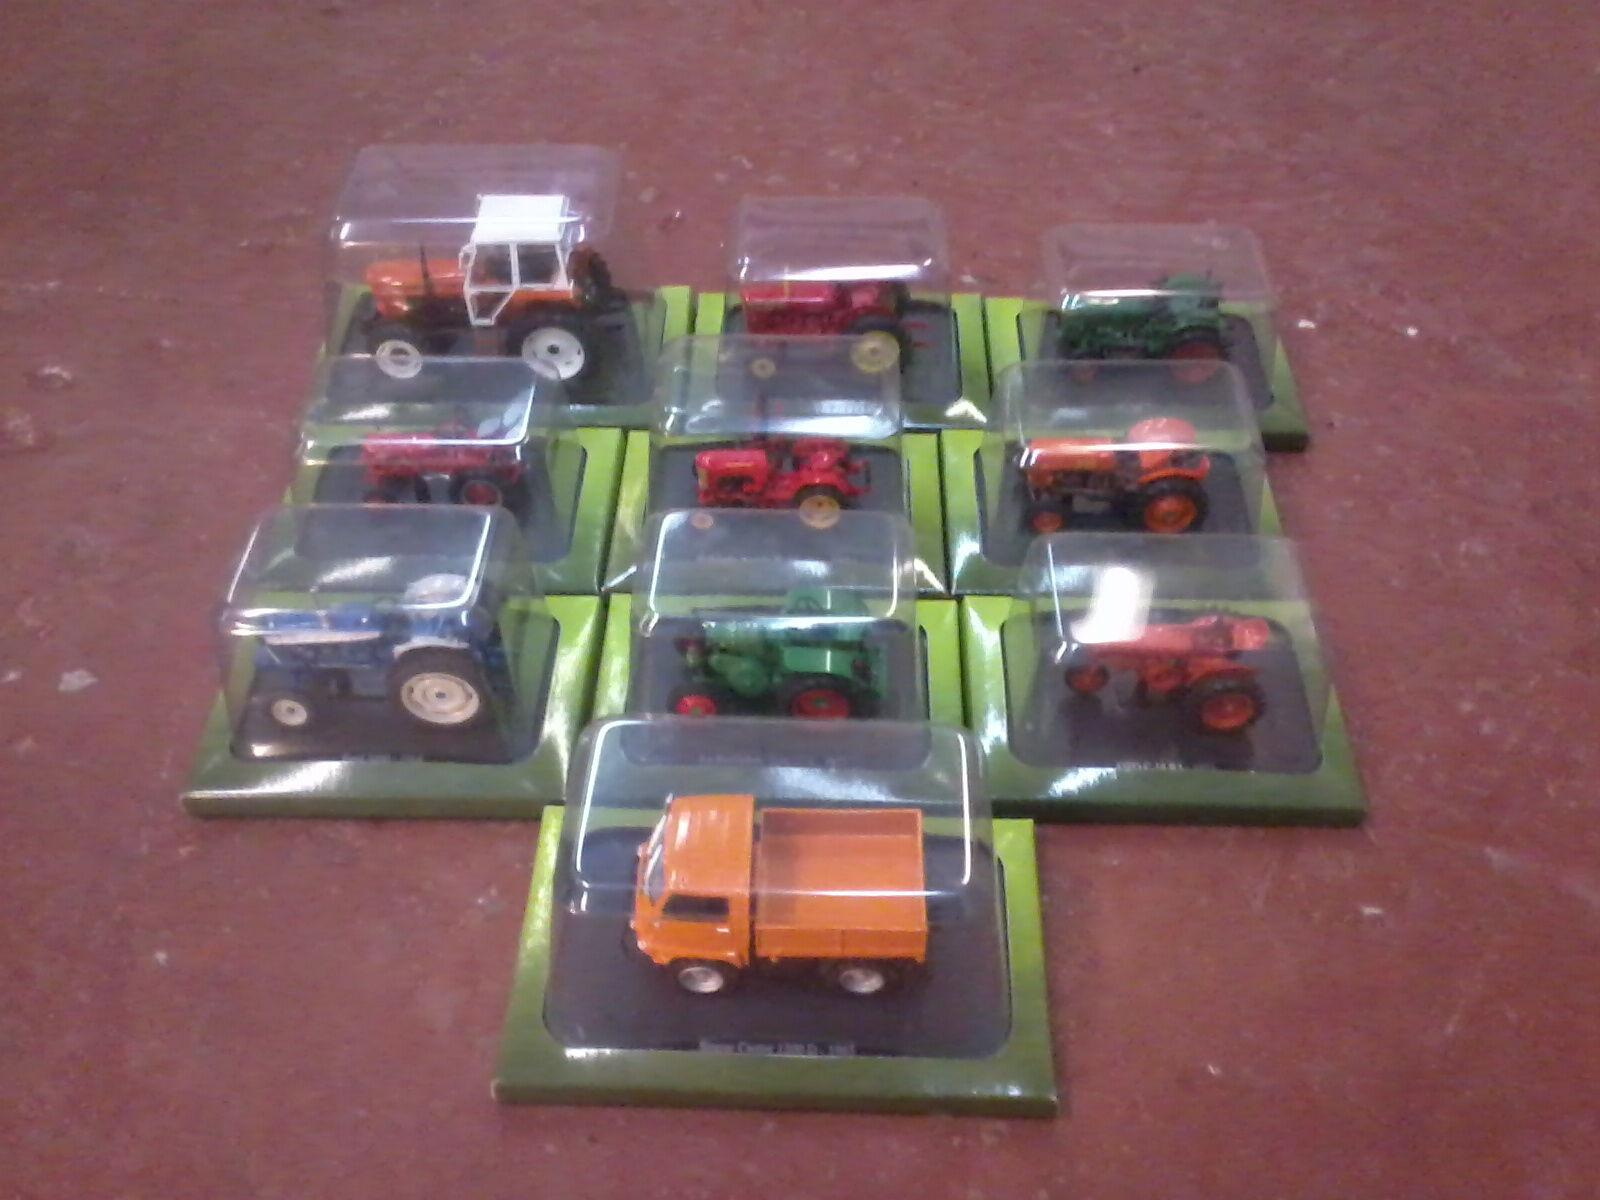 10 x hachette model tractors